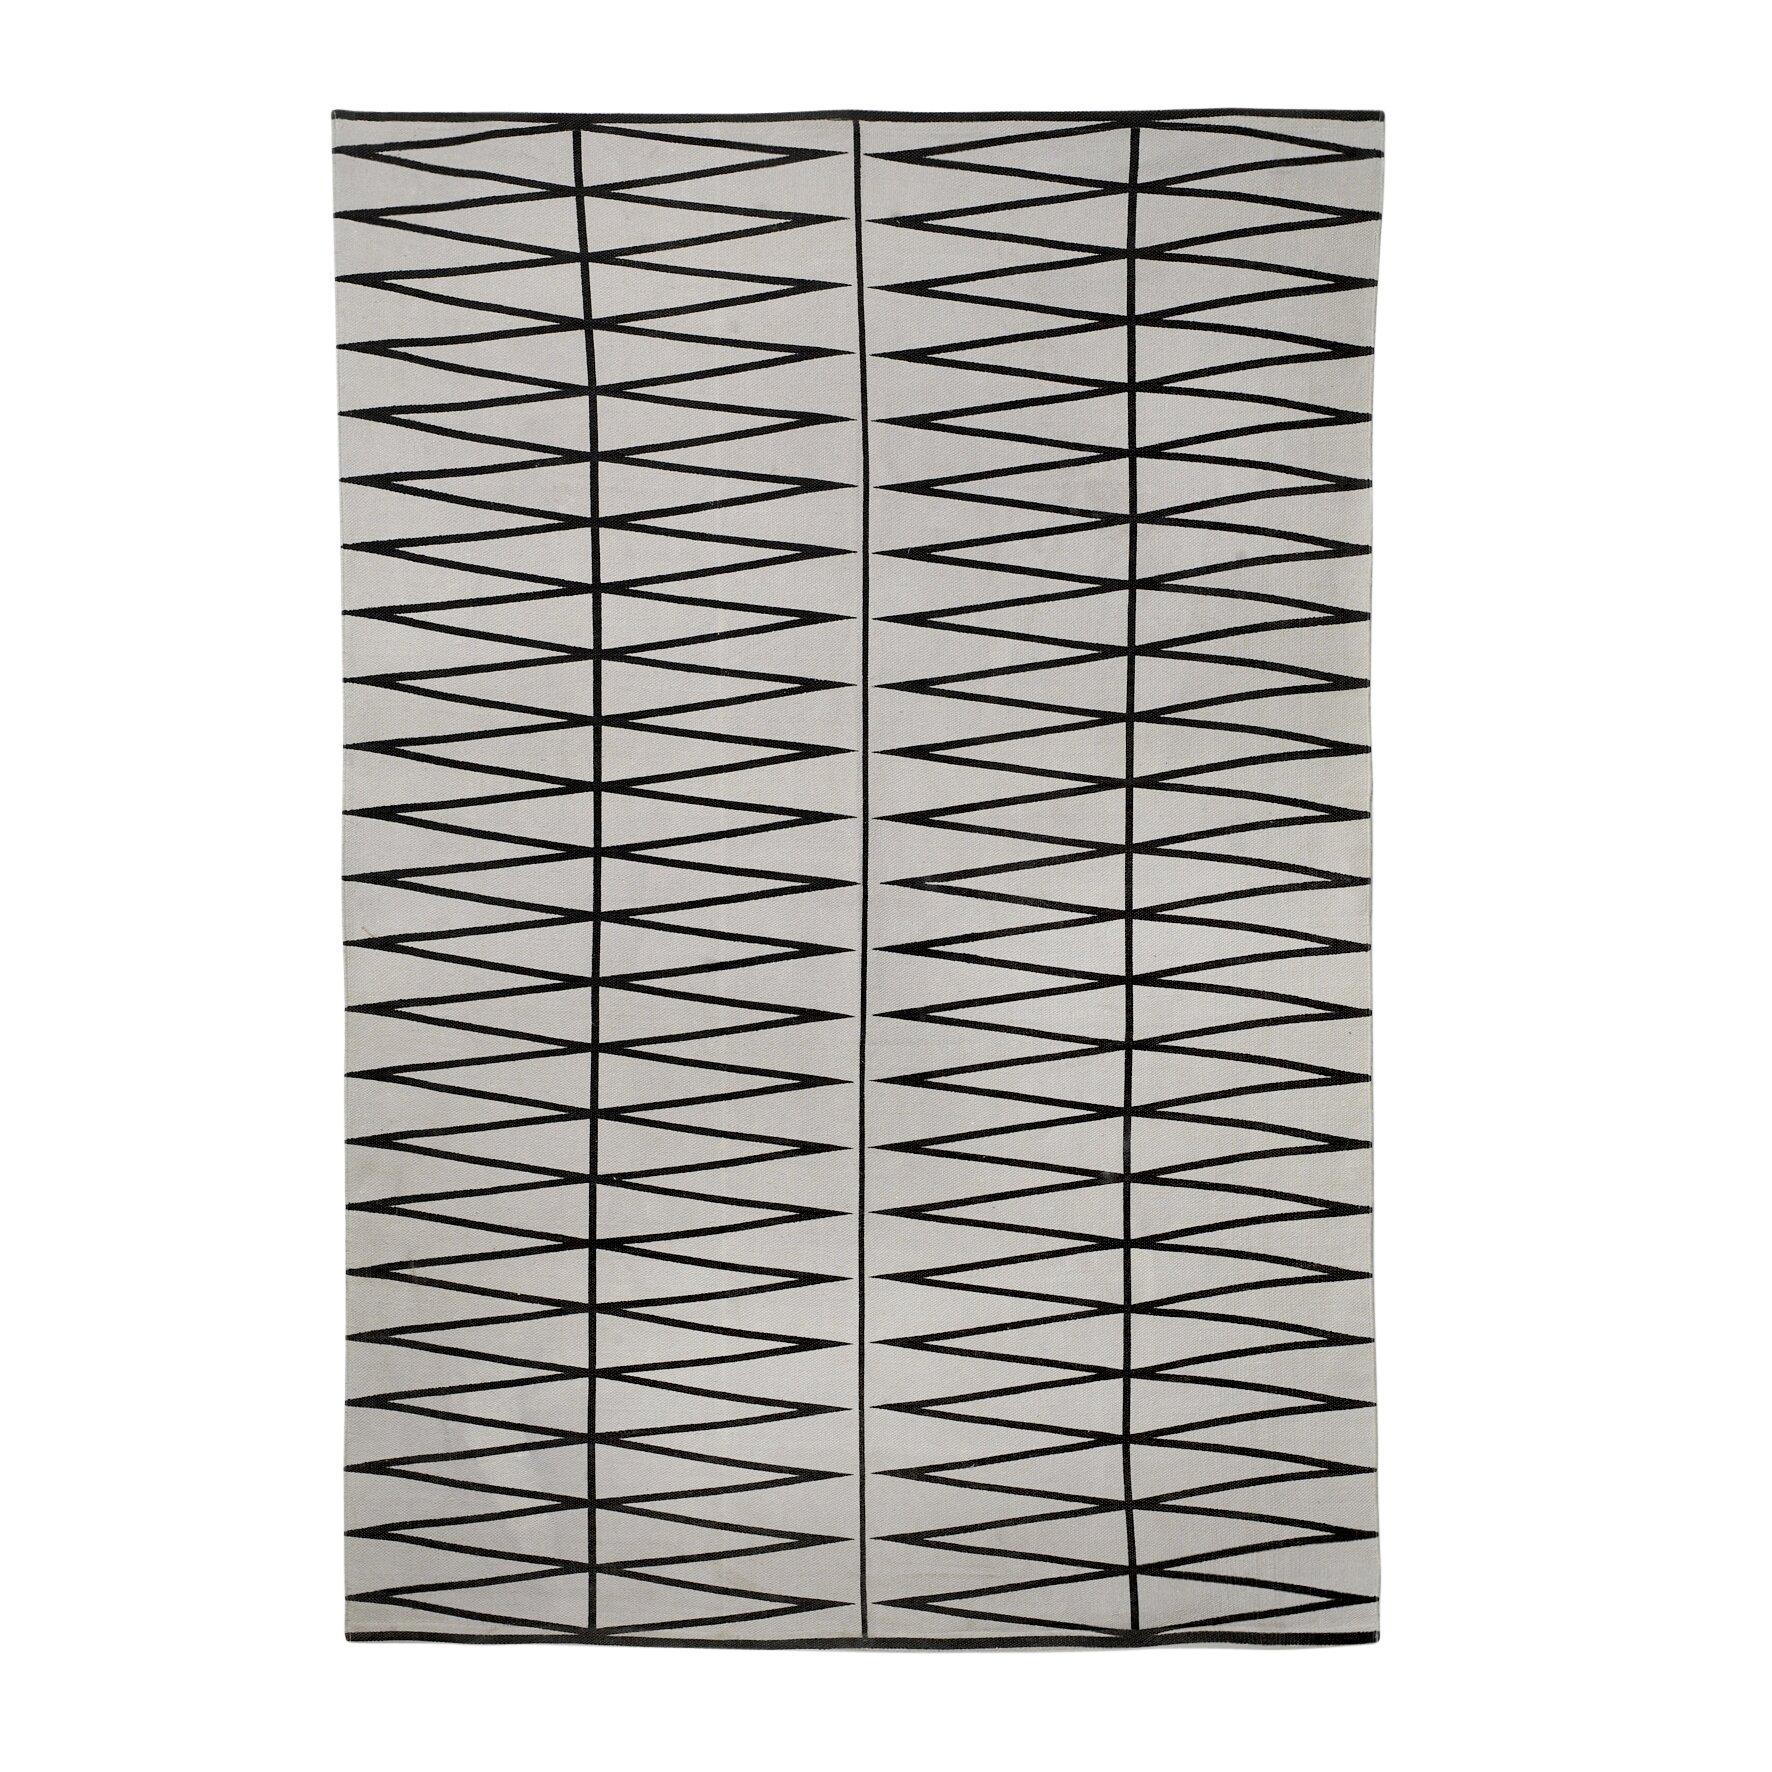 bloomingville teppich in grau reviews von bloomingville. Black Bedroom Furniture Sets. Home Design Ideas